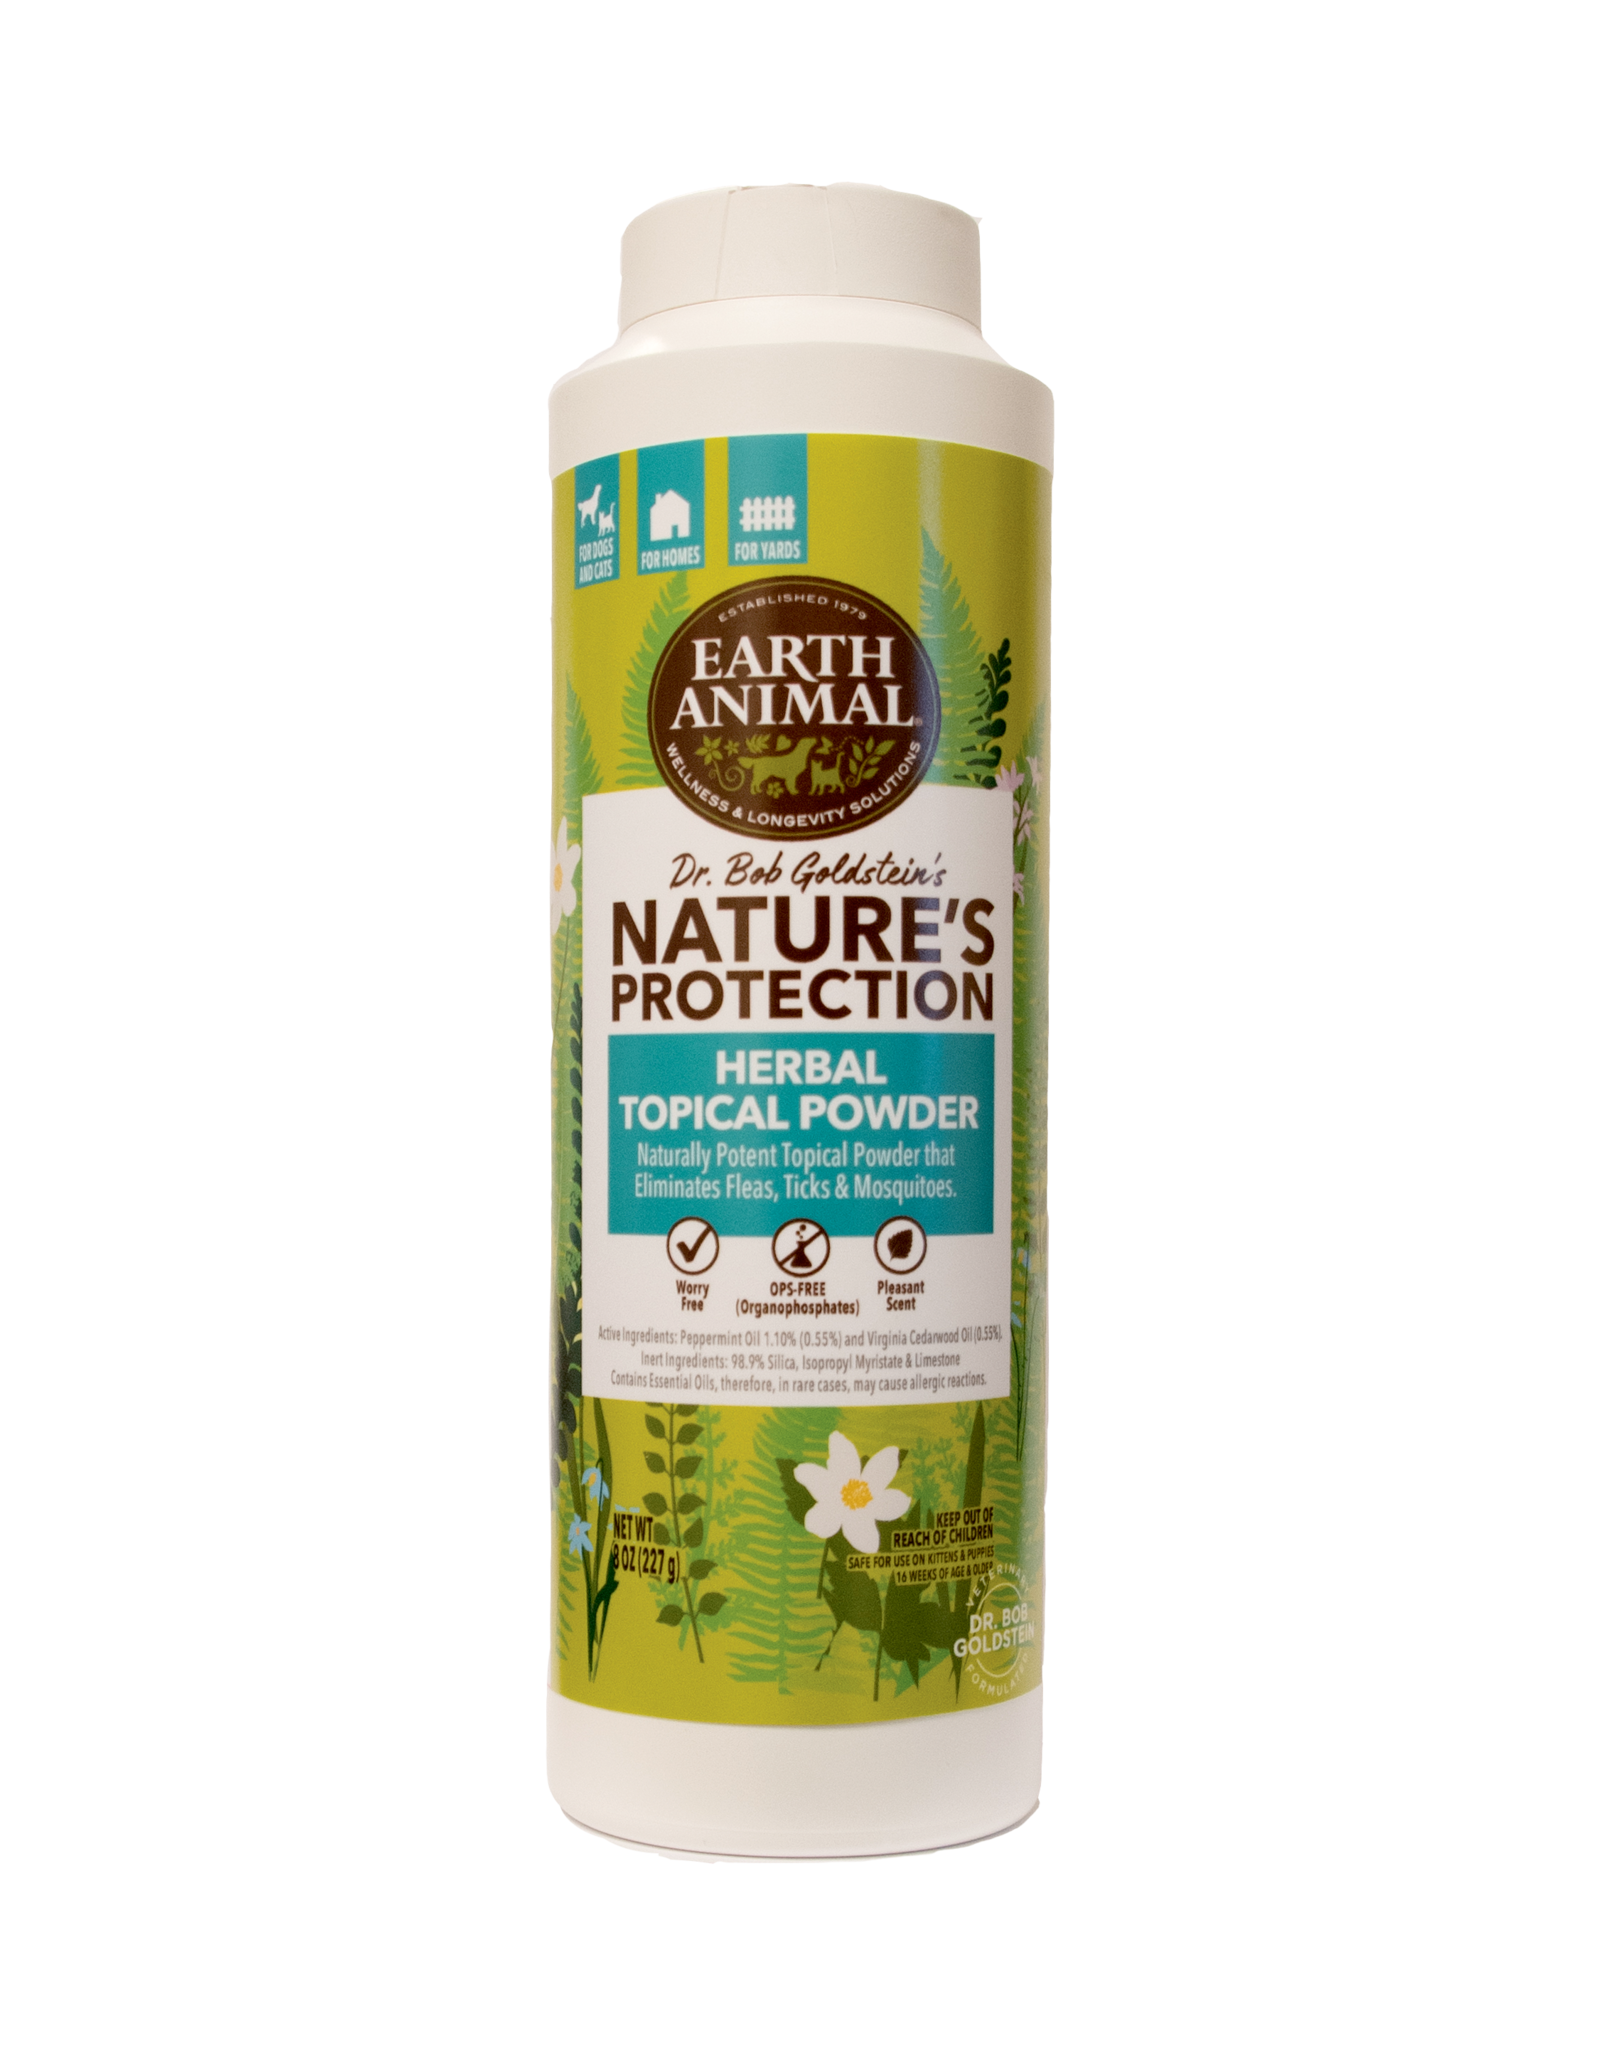 Earth Animal Earth Animal Herbal Topical Powder